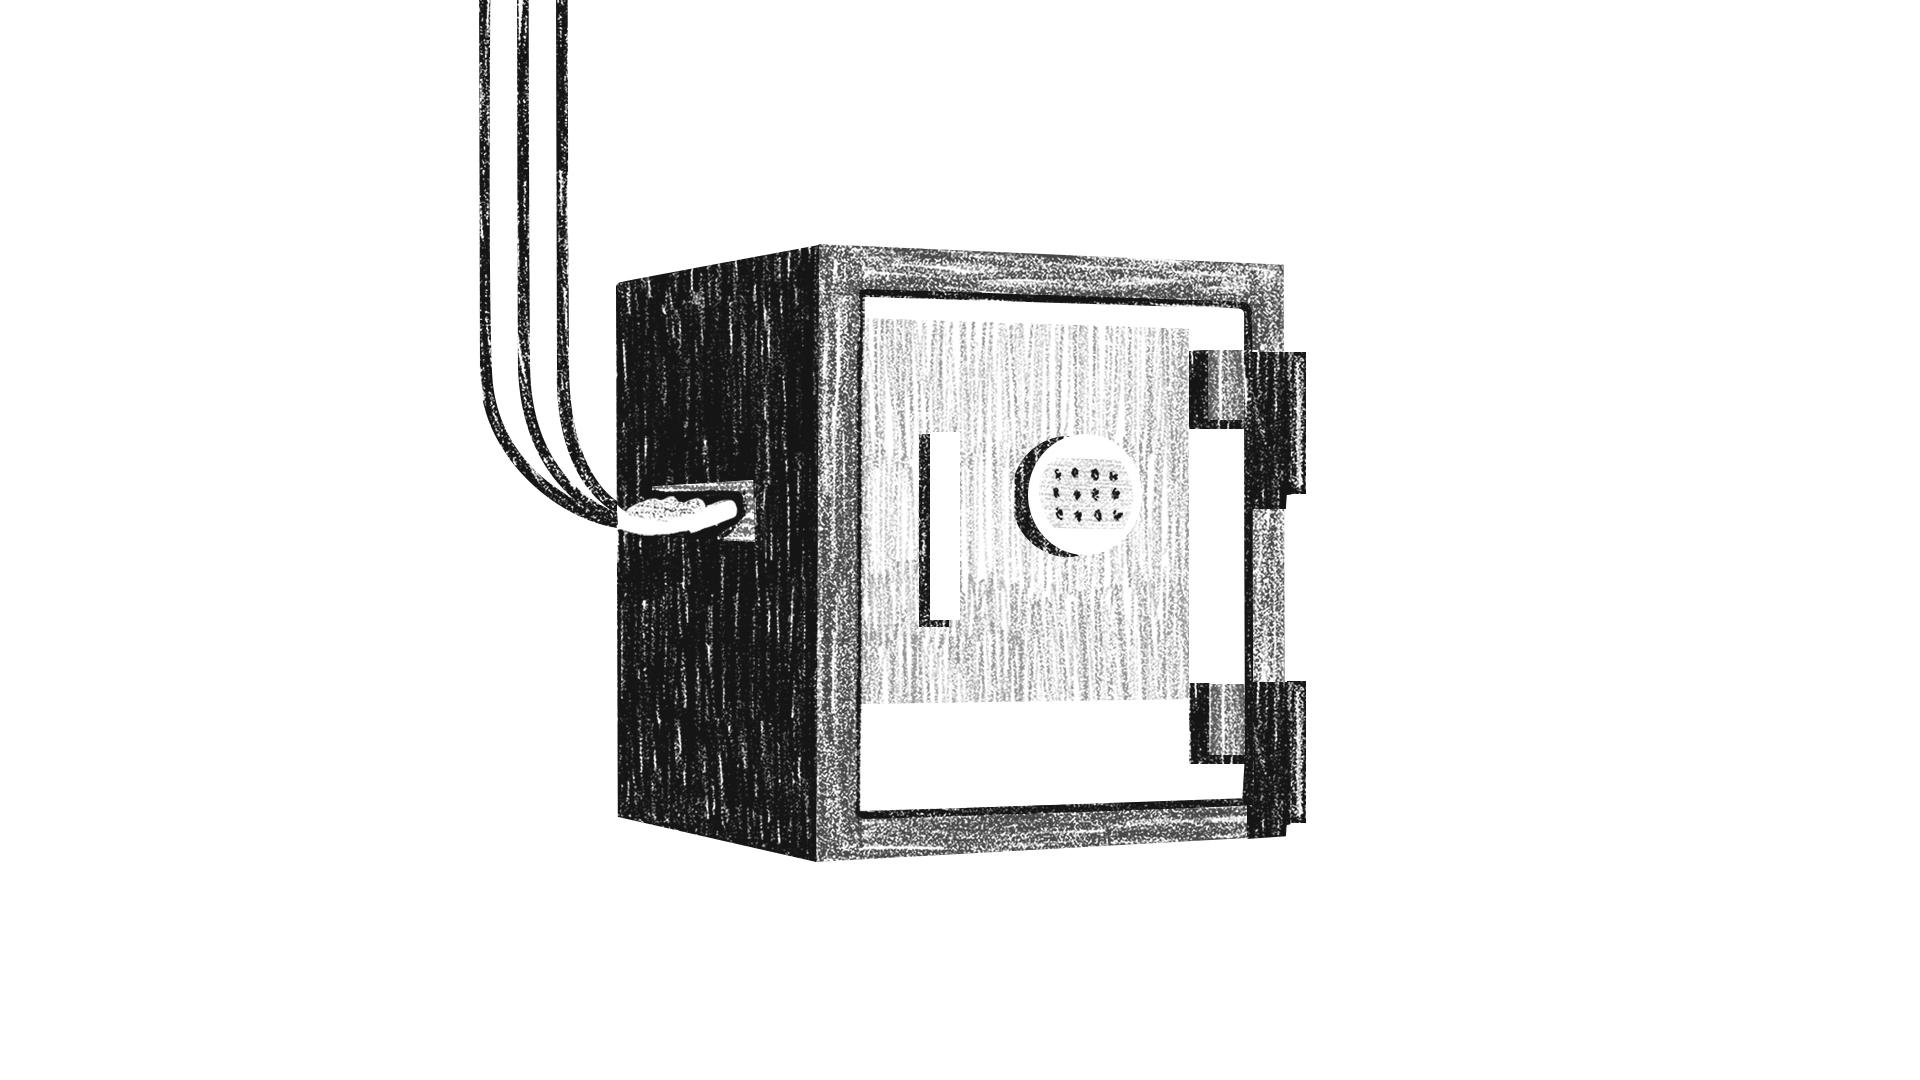 Box_5.jpg